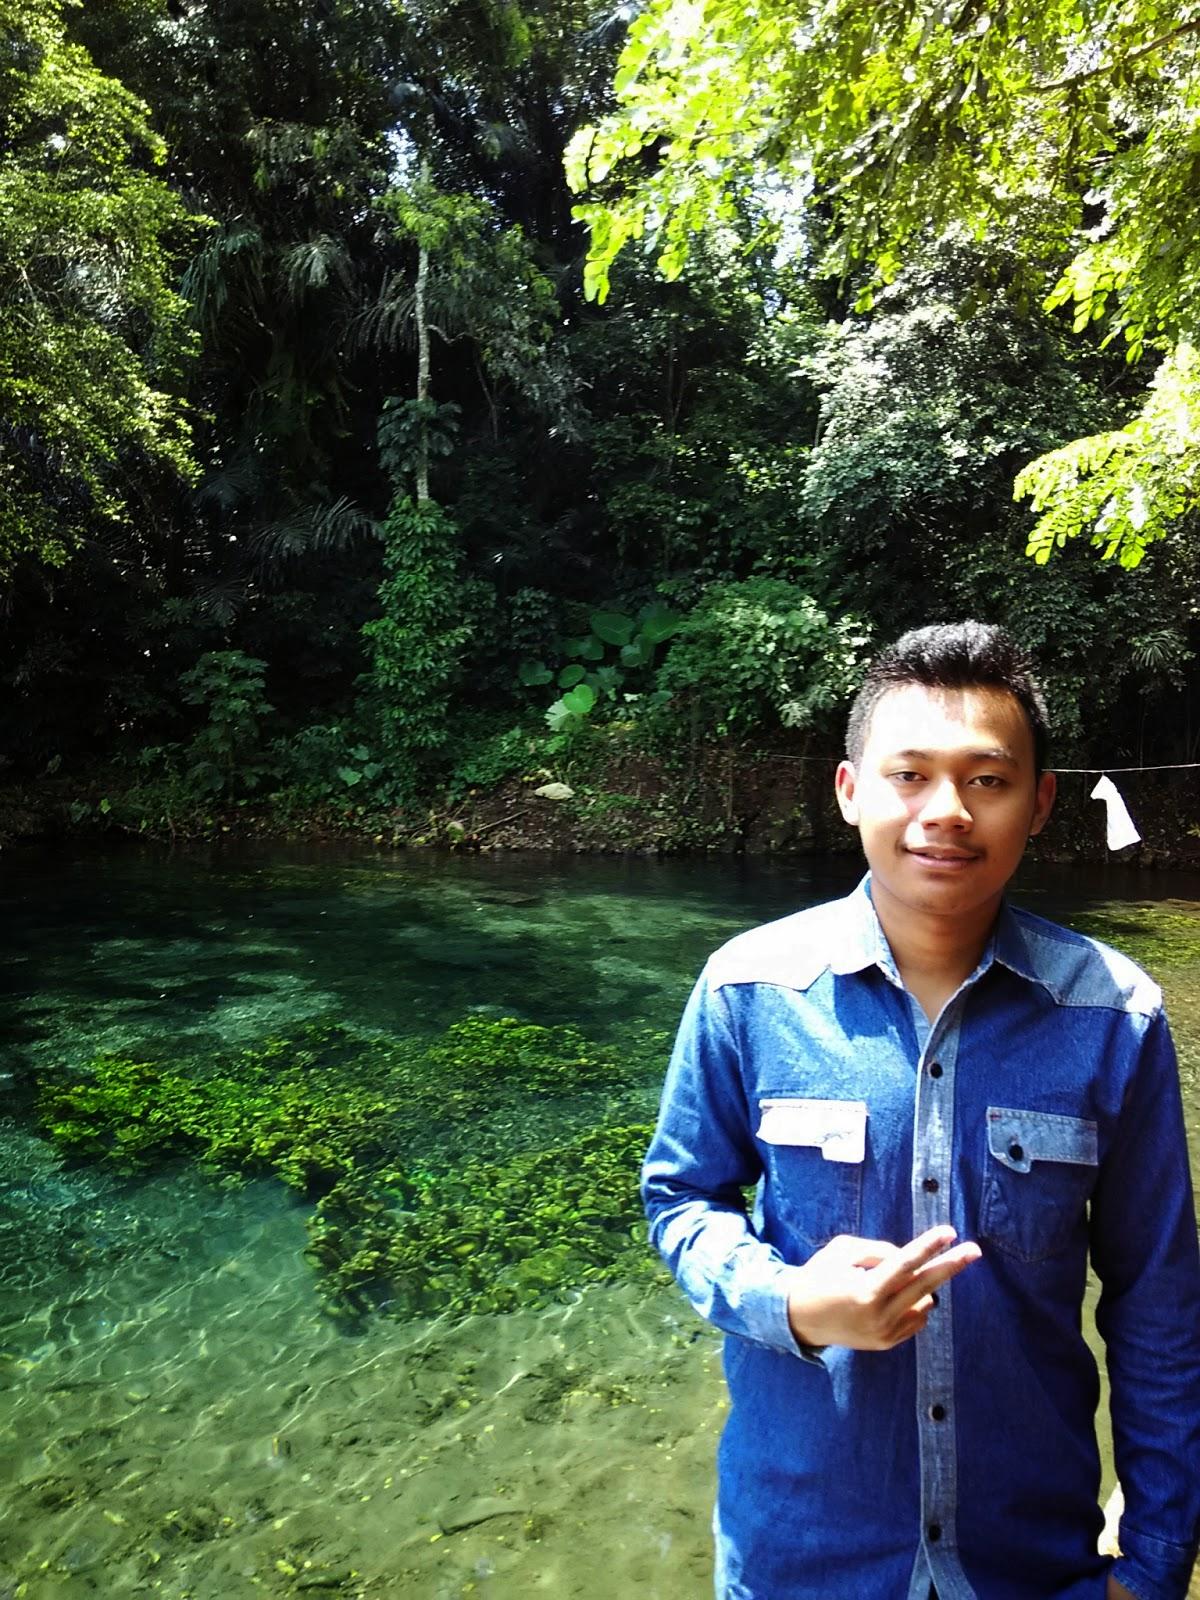 Sumber Sirah Gondanglegi : sumber, sirah, gondanglegi, Selow, Adventure:, Sumber, Sirah, Gondanglegi, Malang